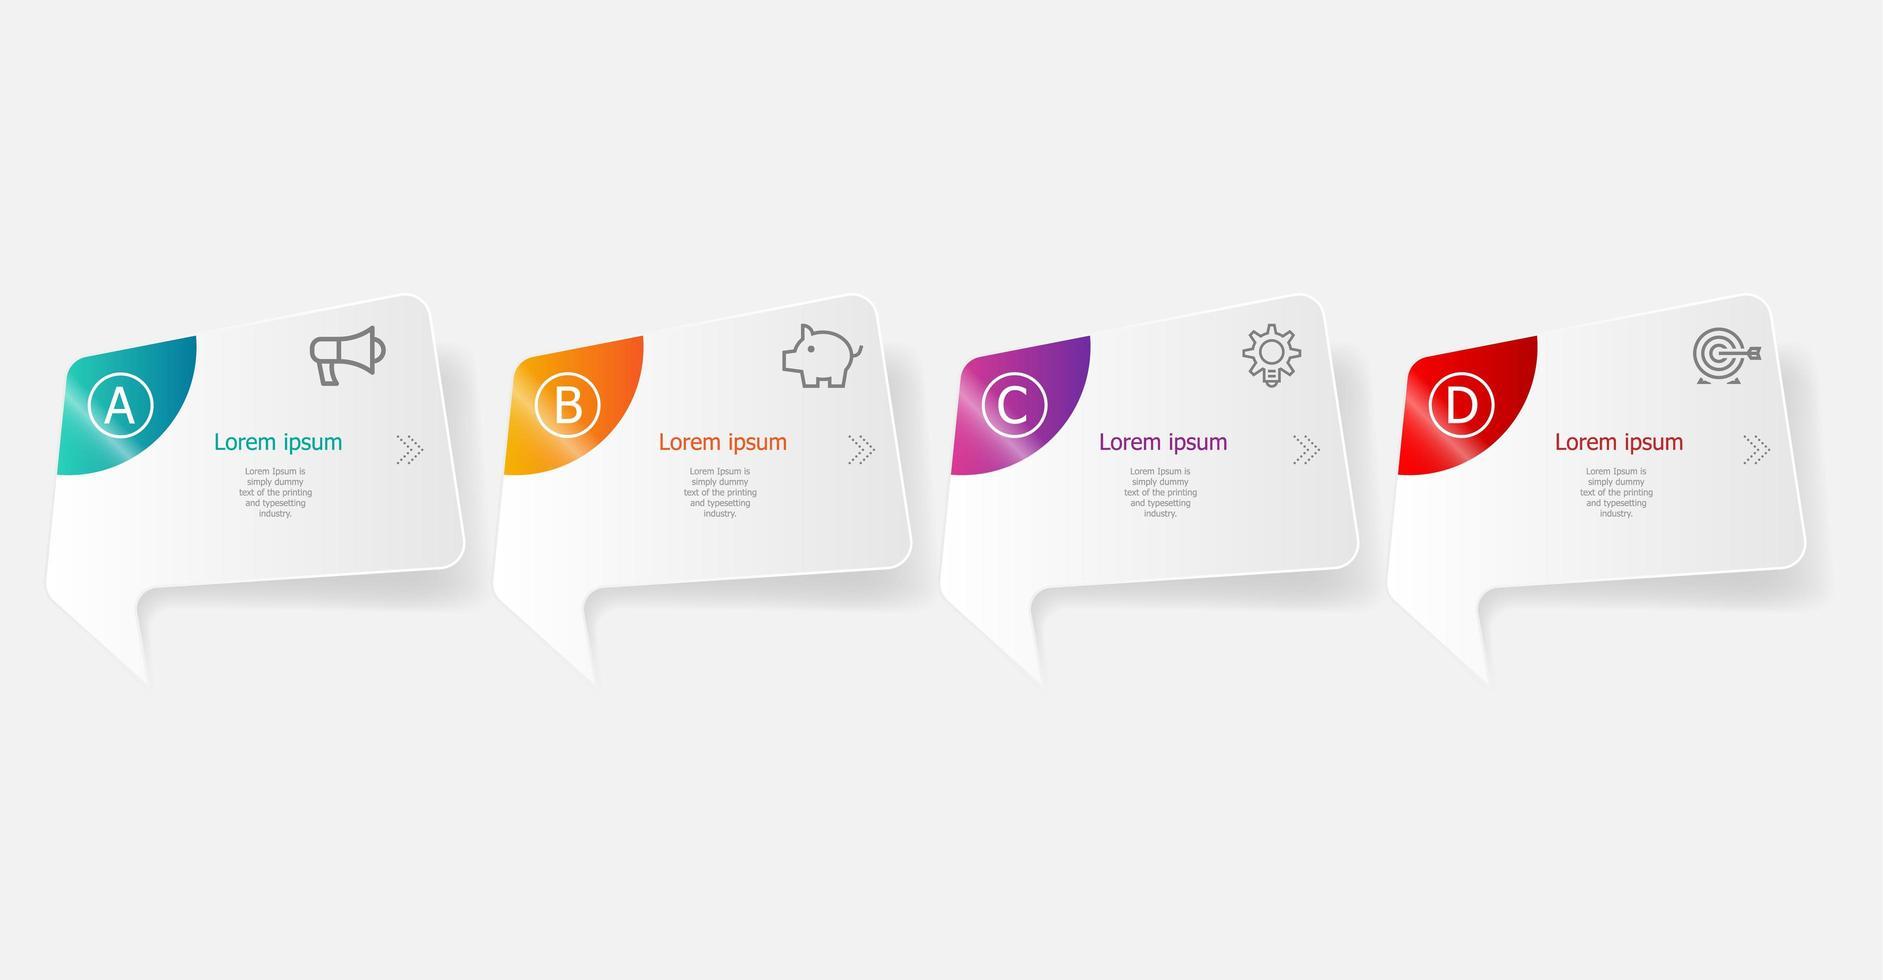 Infografía horizontal abstracta 4 pasos para negocios y presentación. vector